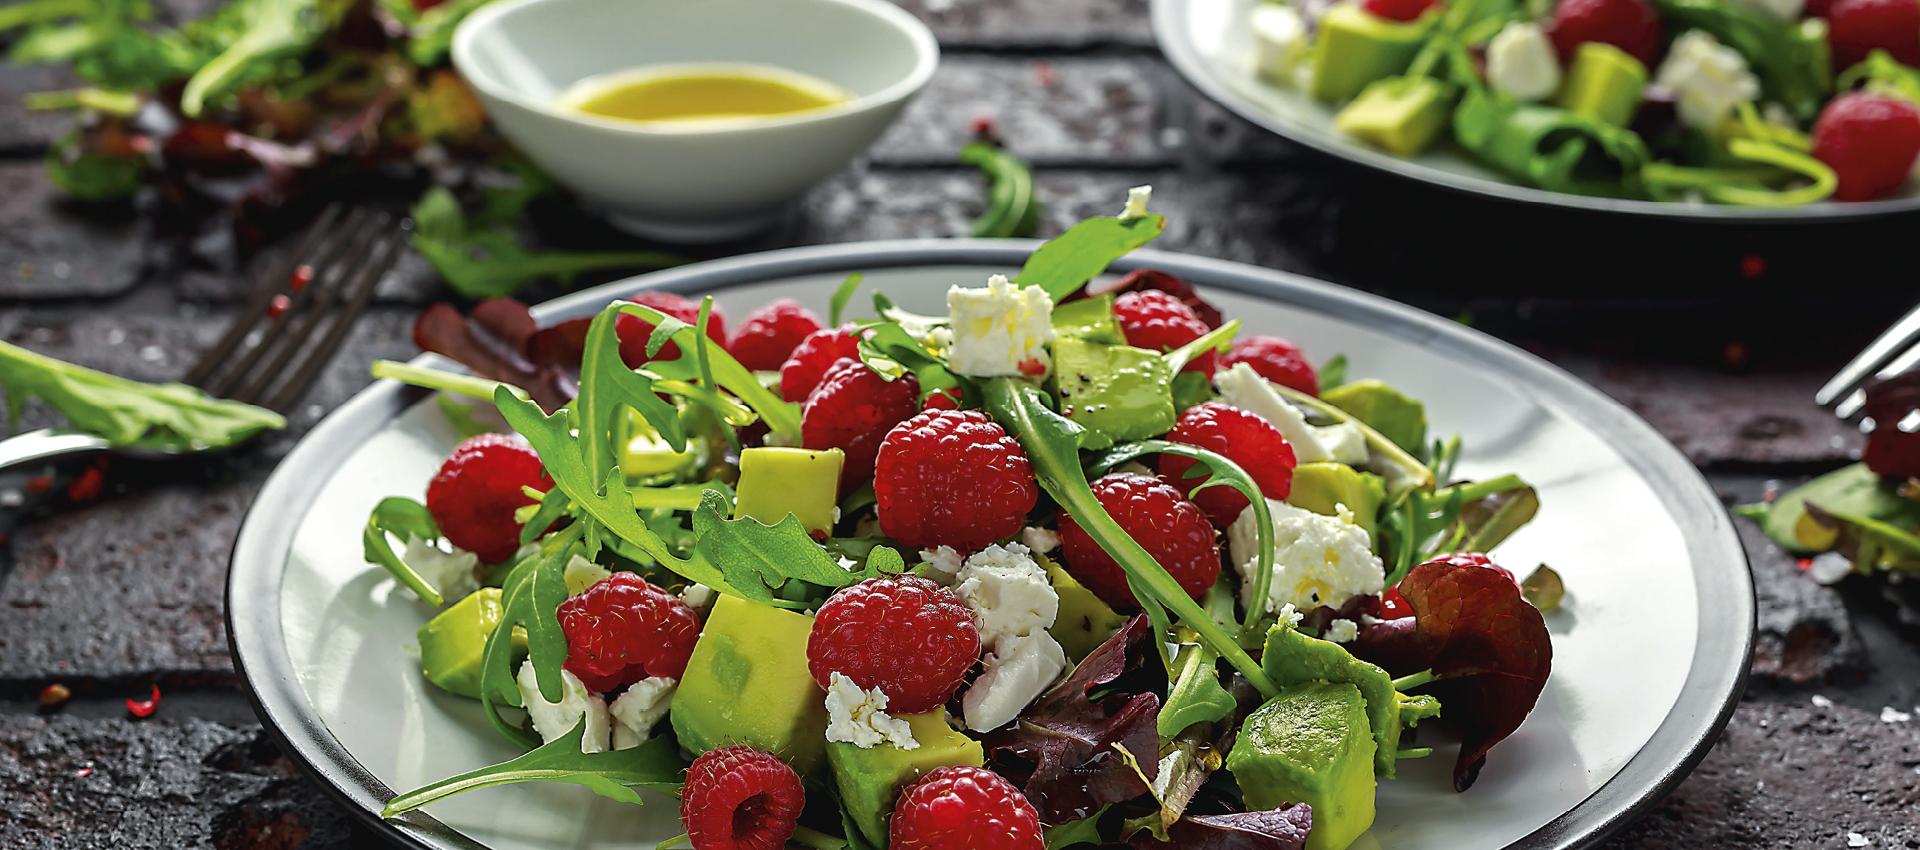 Salata s avokadom i malinama.jpg